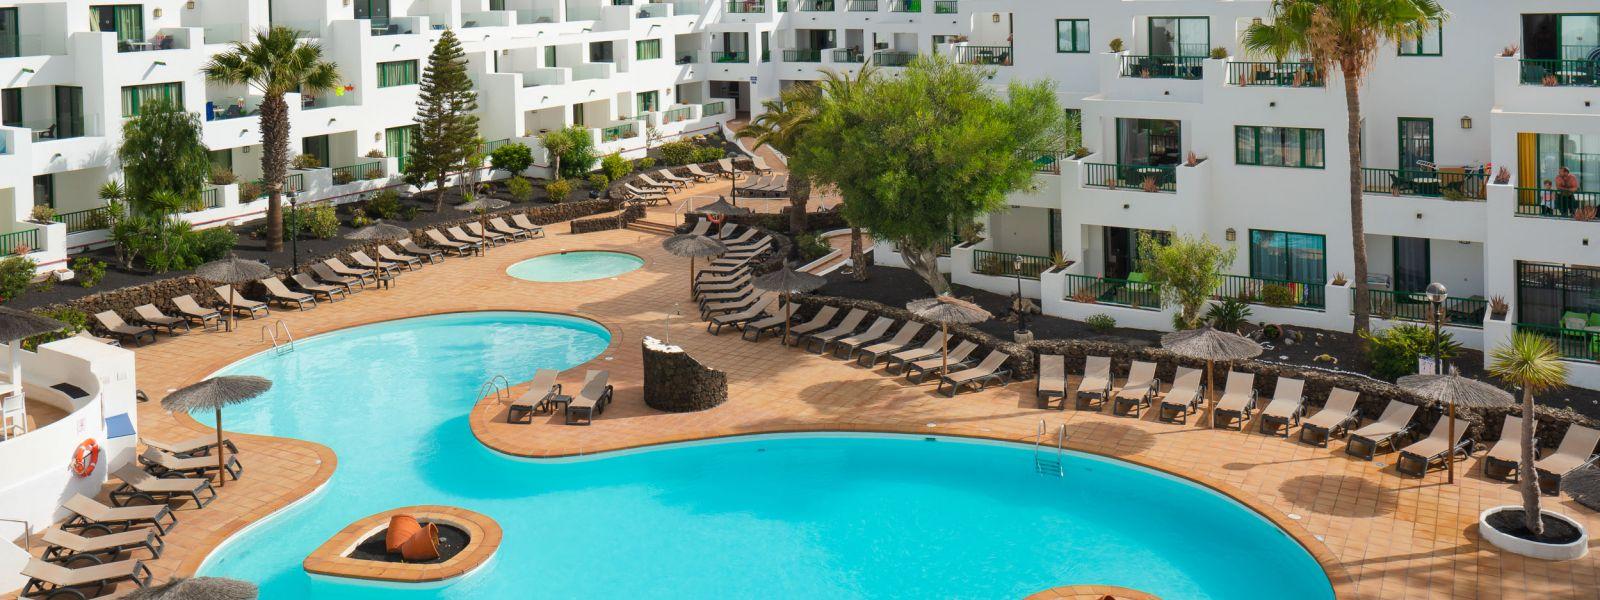 Offres appartements à Costa Teguise